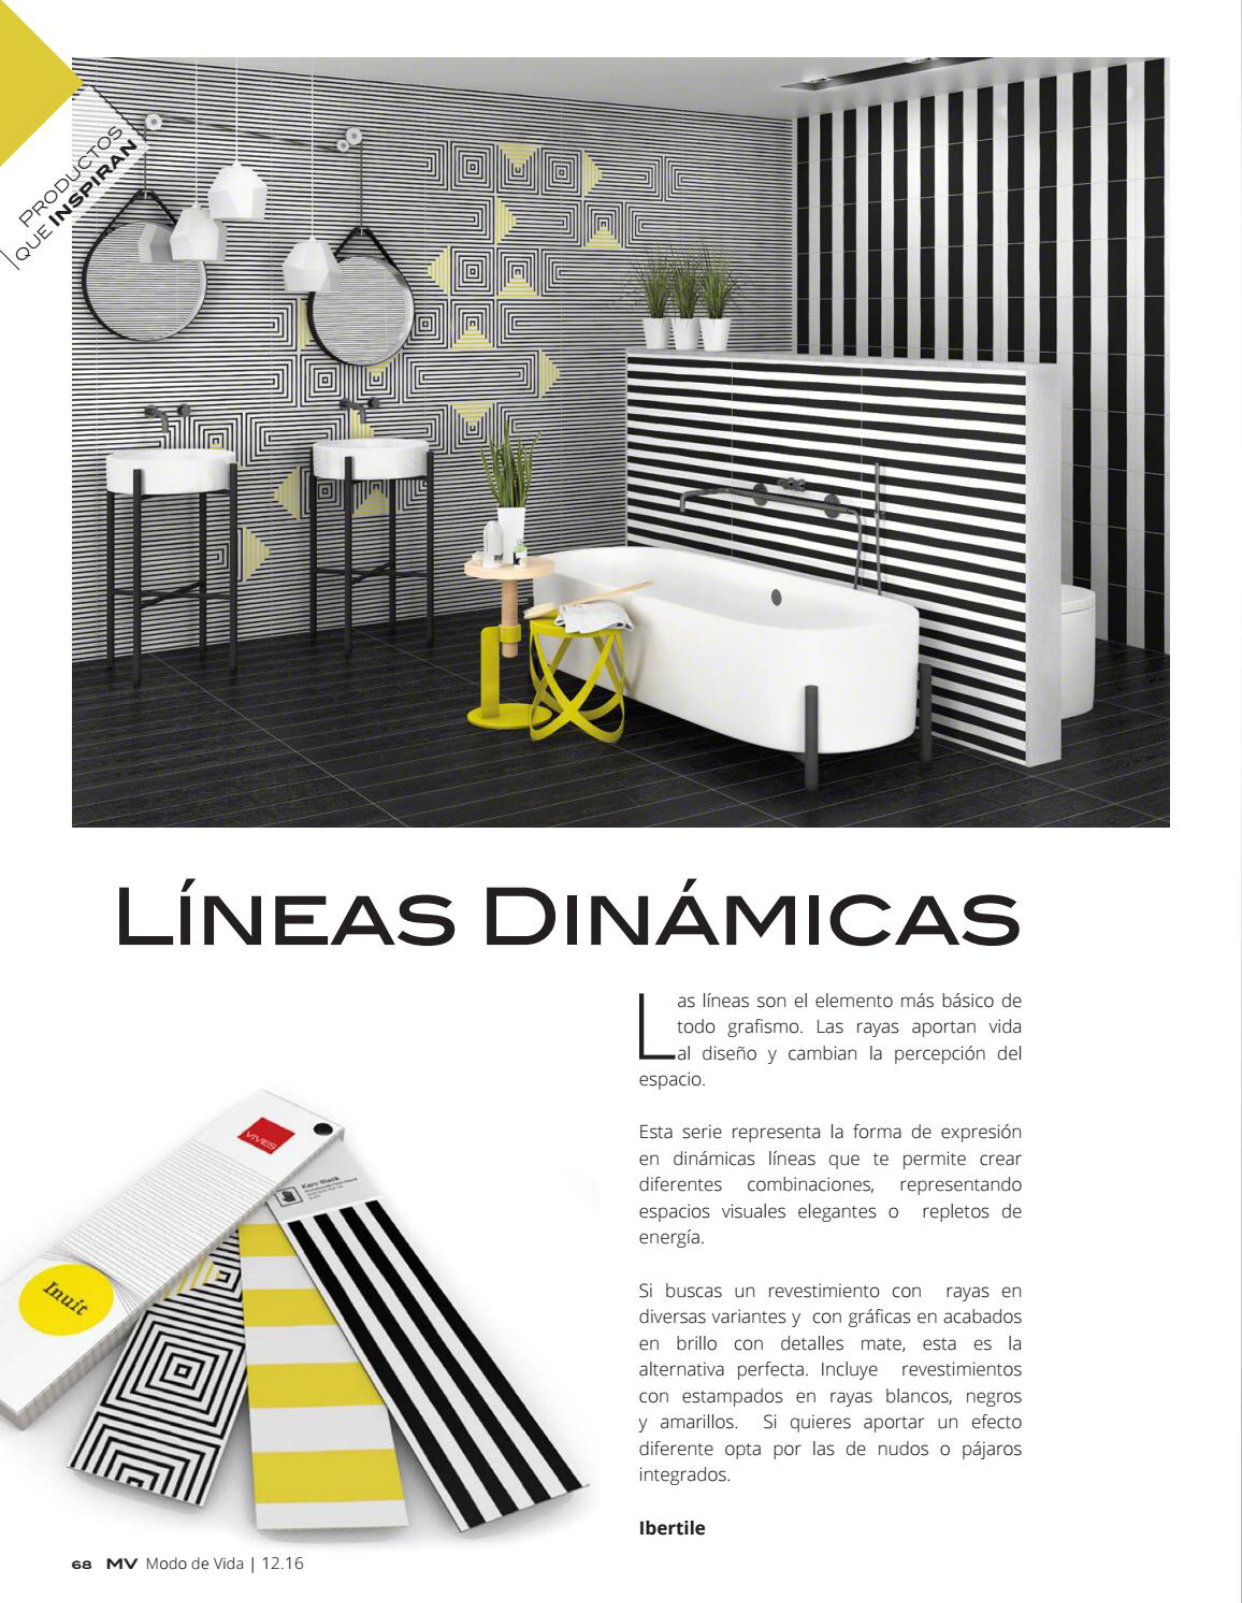 Líneas dinámicas